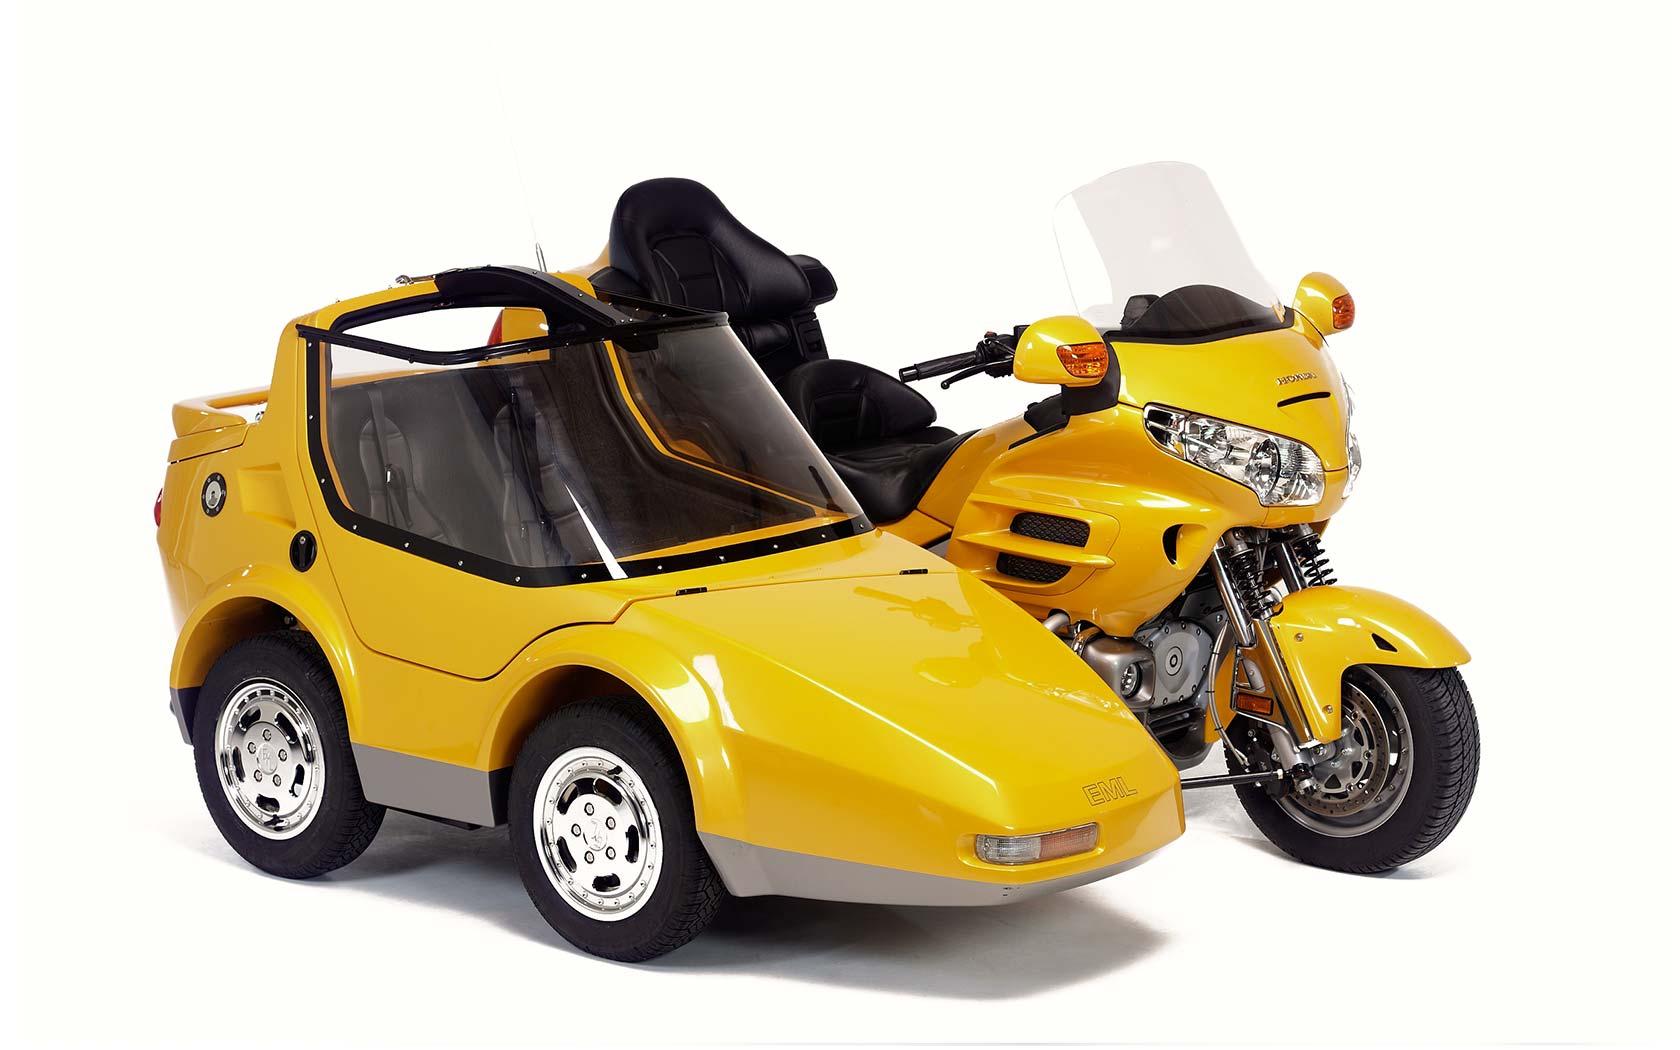 GT Twin - EML Trikes & Sidecars